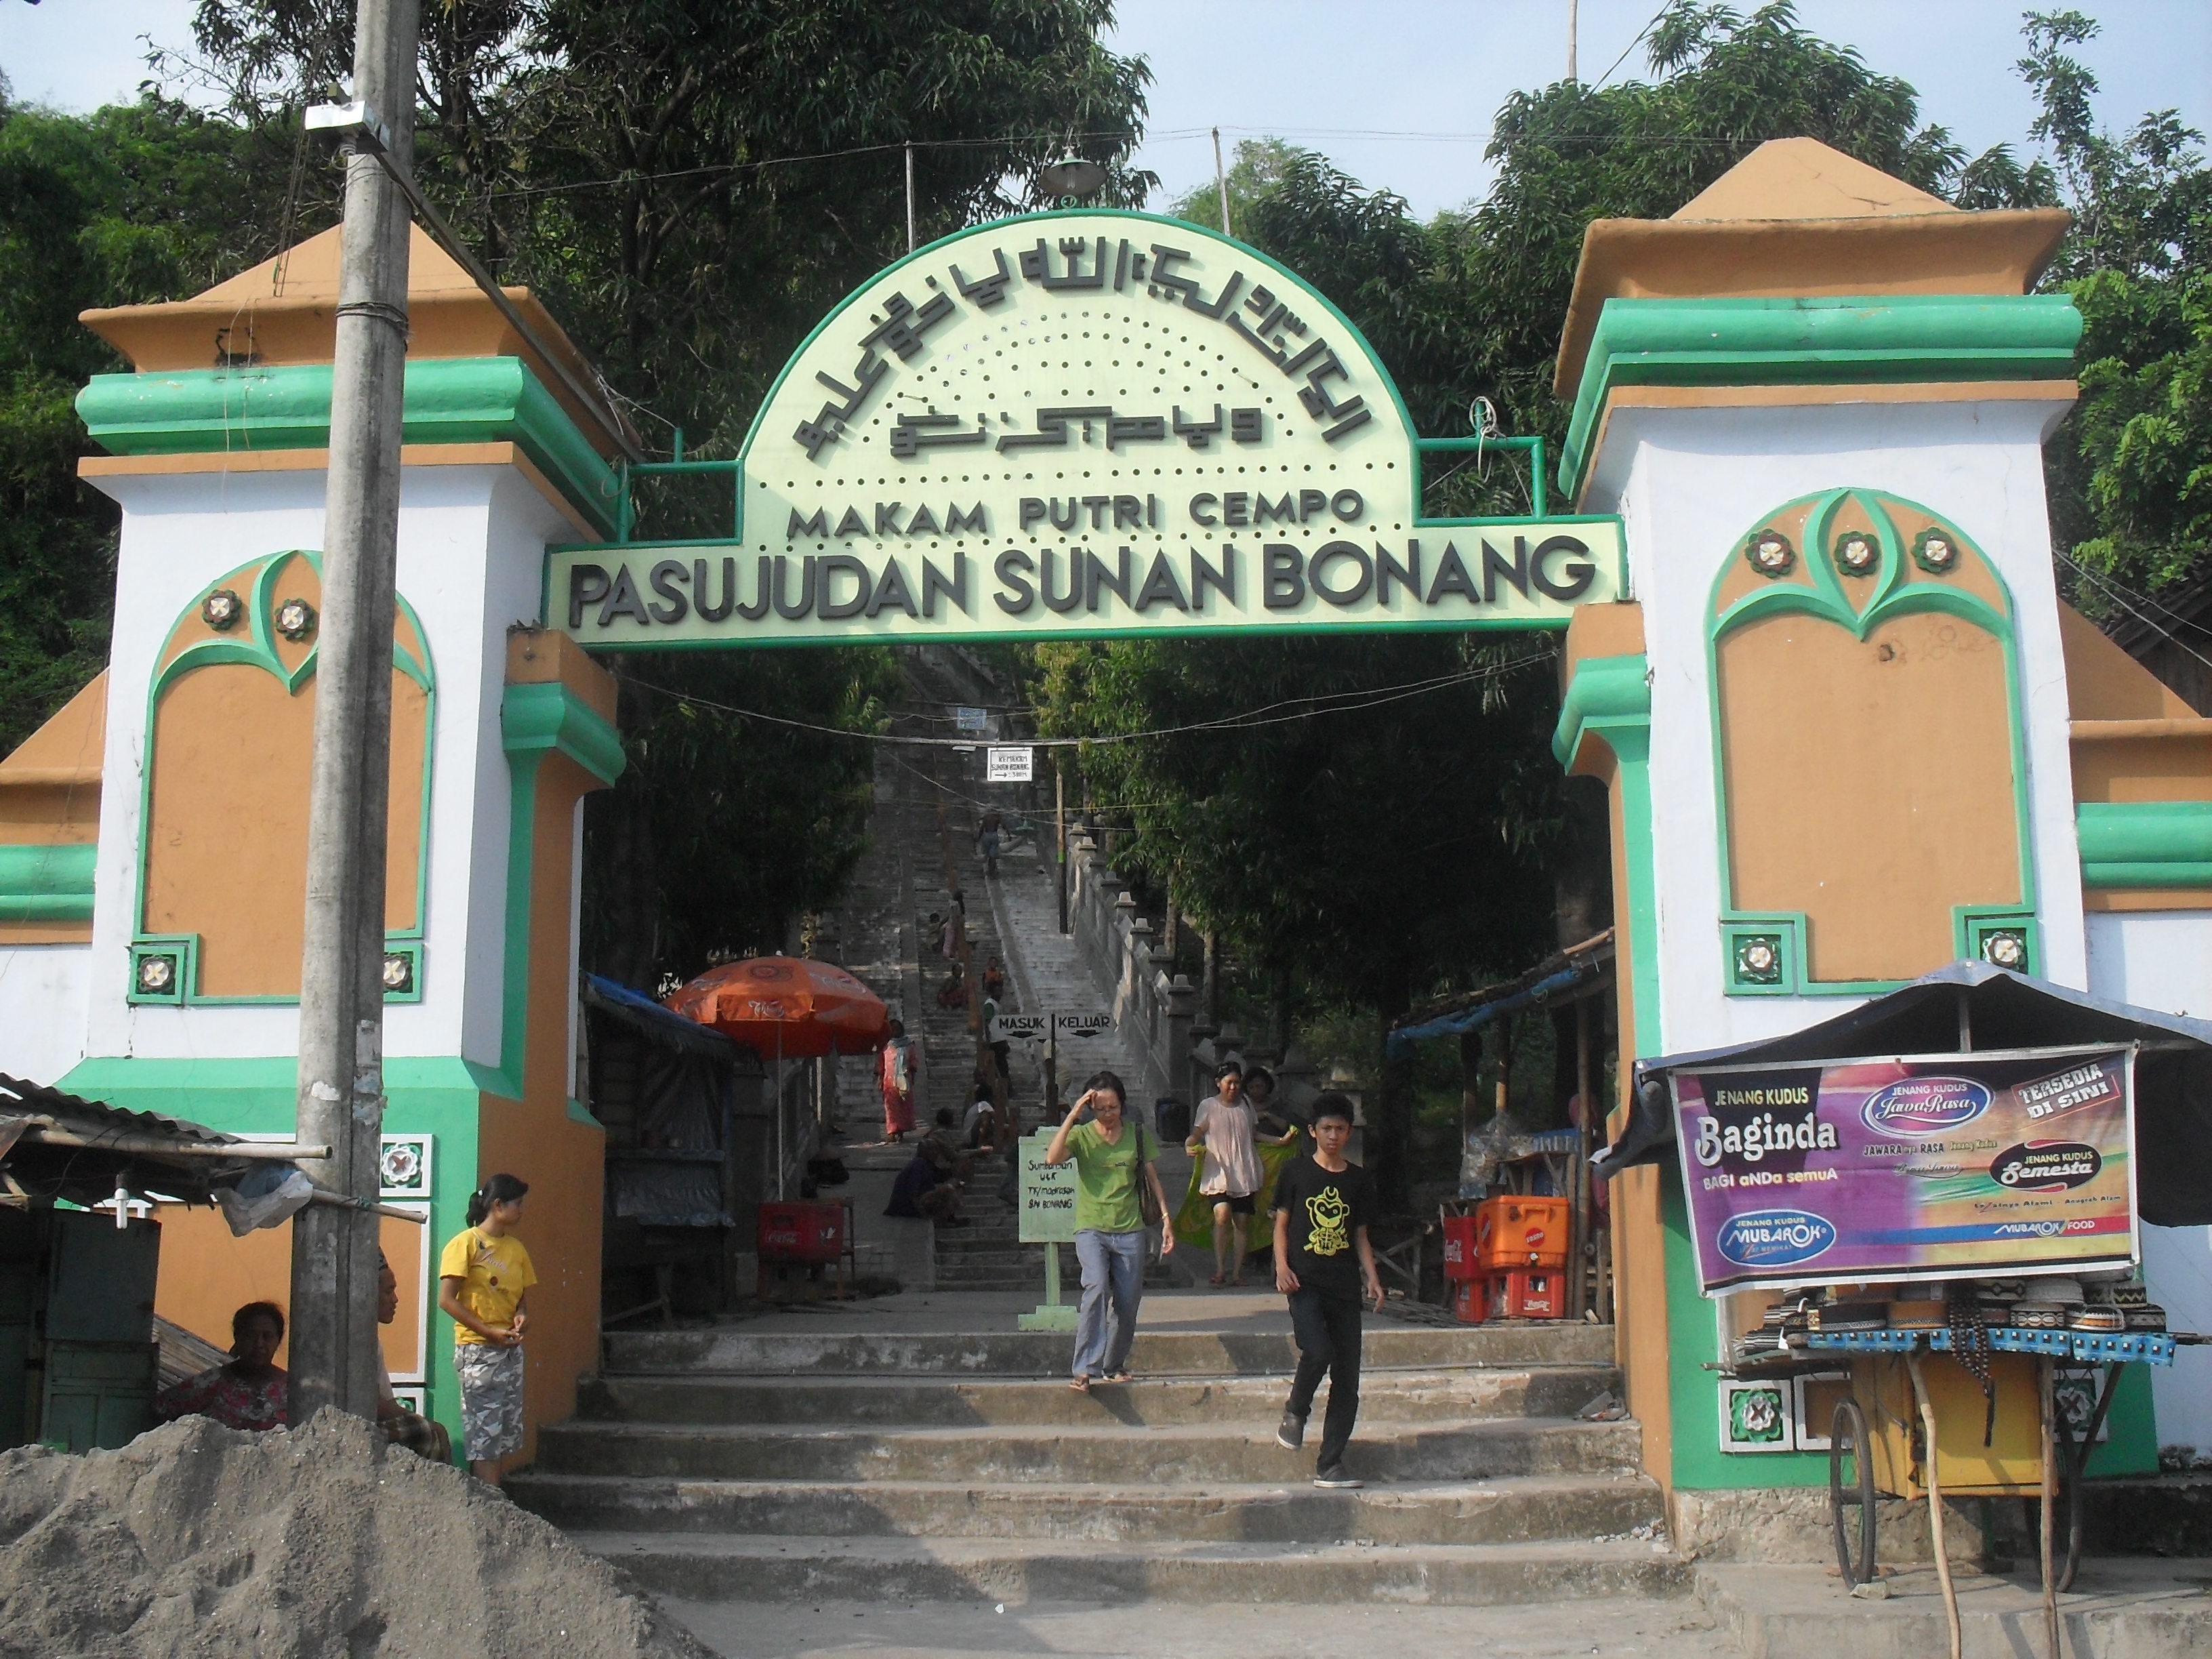 Menyusuri Jejak Walisongo Tanah Jawa Pulau Forum Jalan2 Gerbang Menuju